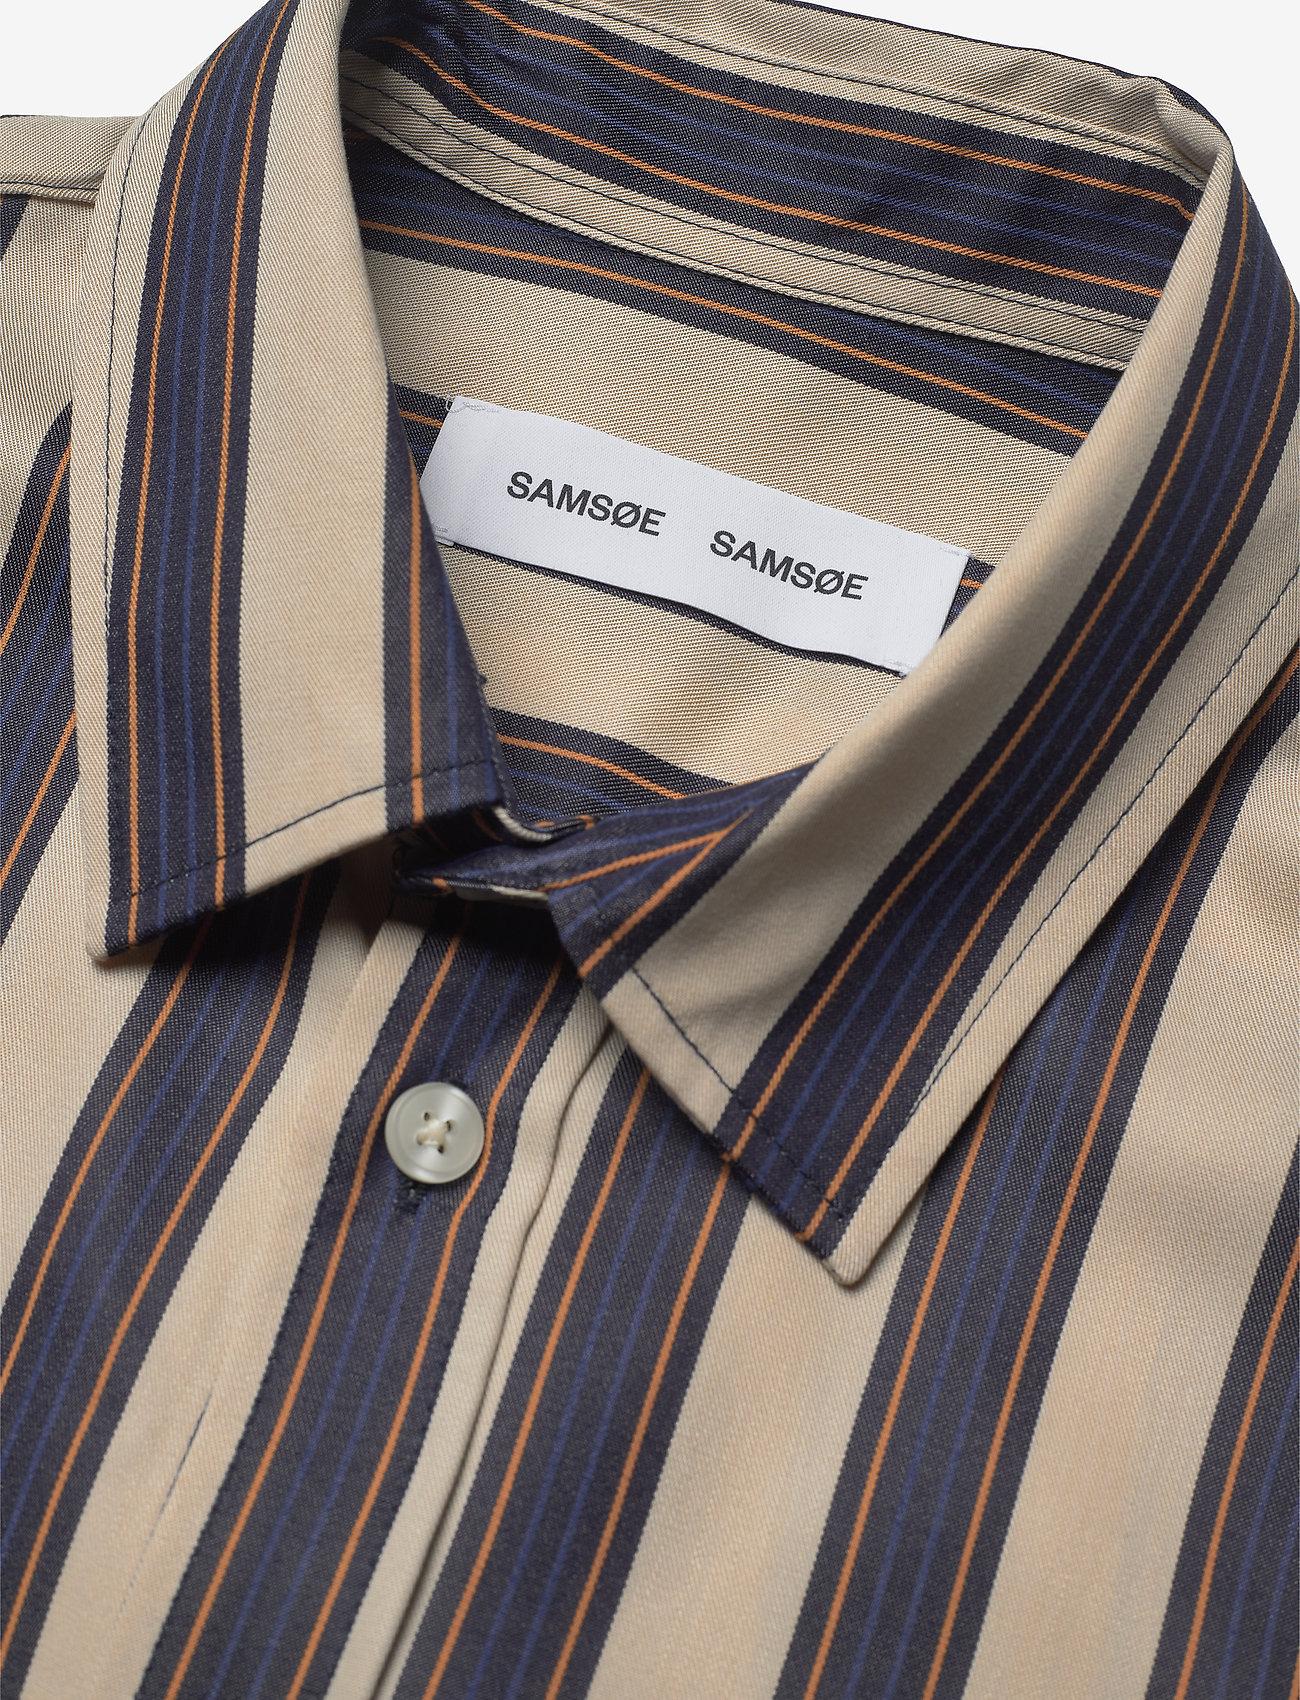 Taro Nx Shirt 10806 (Pumice Stone St.) - Samsøe Samsøe 5JA5Mk